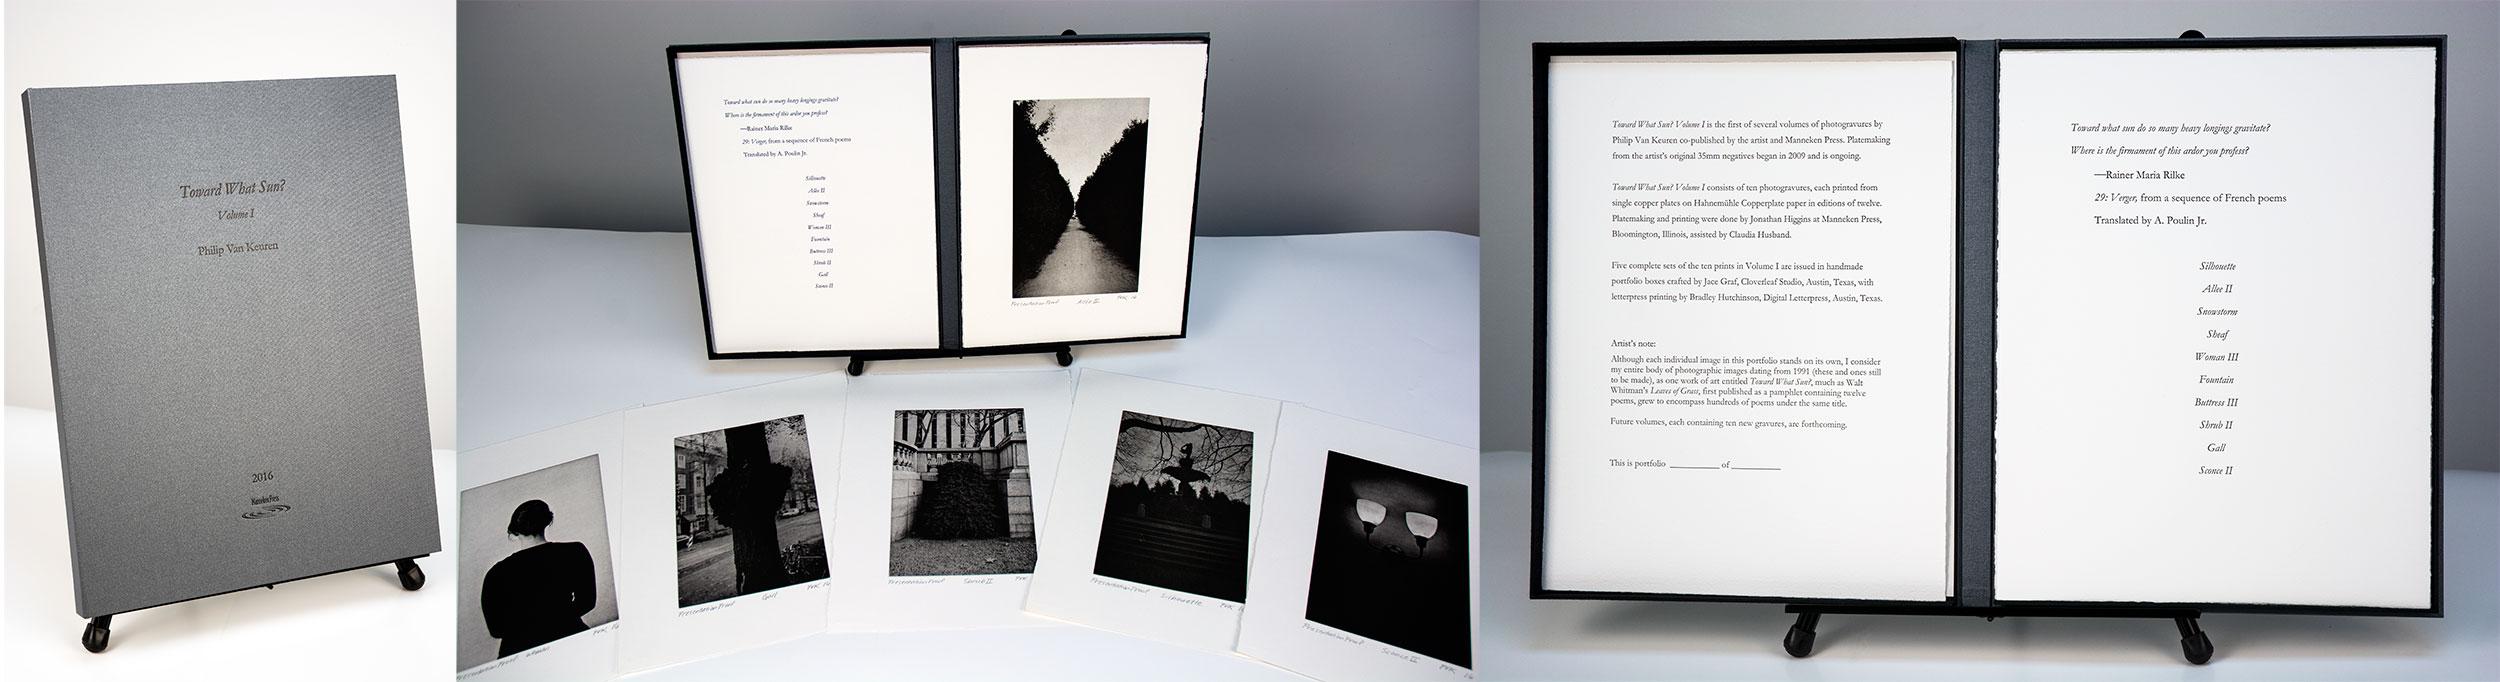 Philip Van Keuren, photogravure, Toward What Sun?, Manneken Press, portfolio